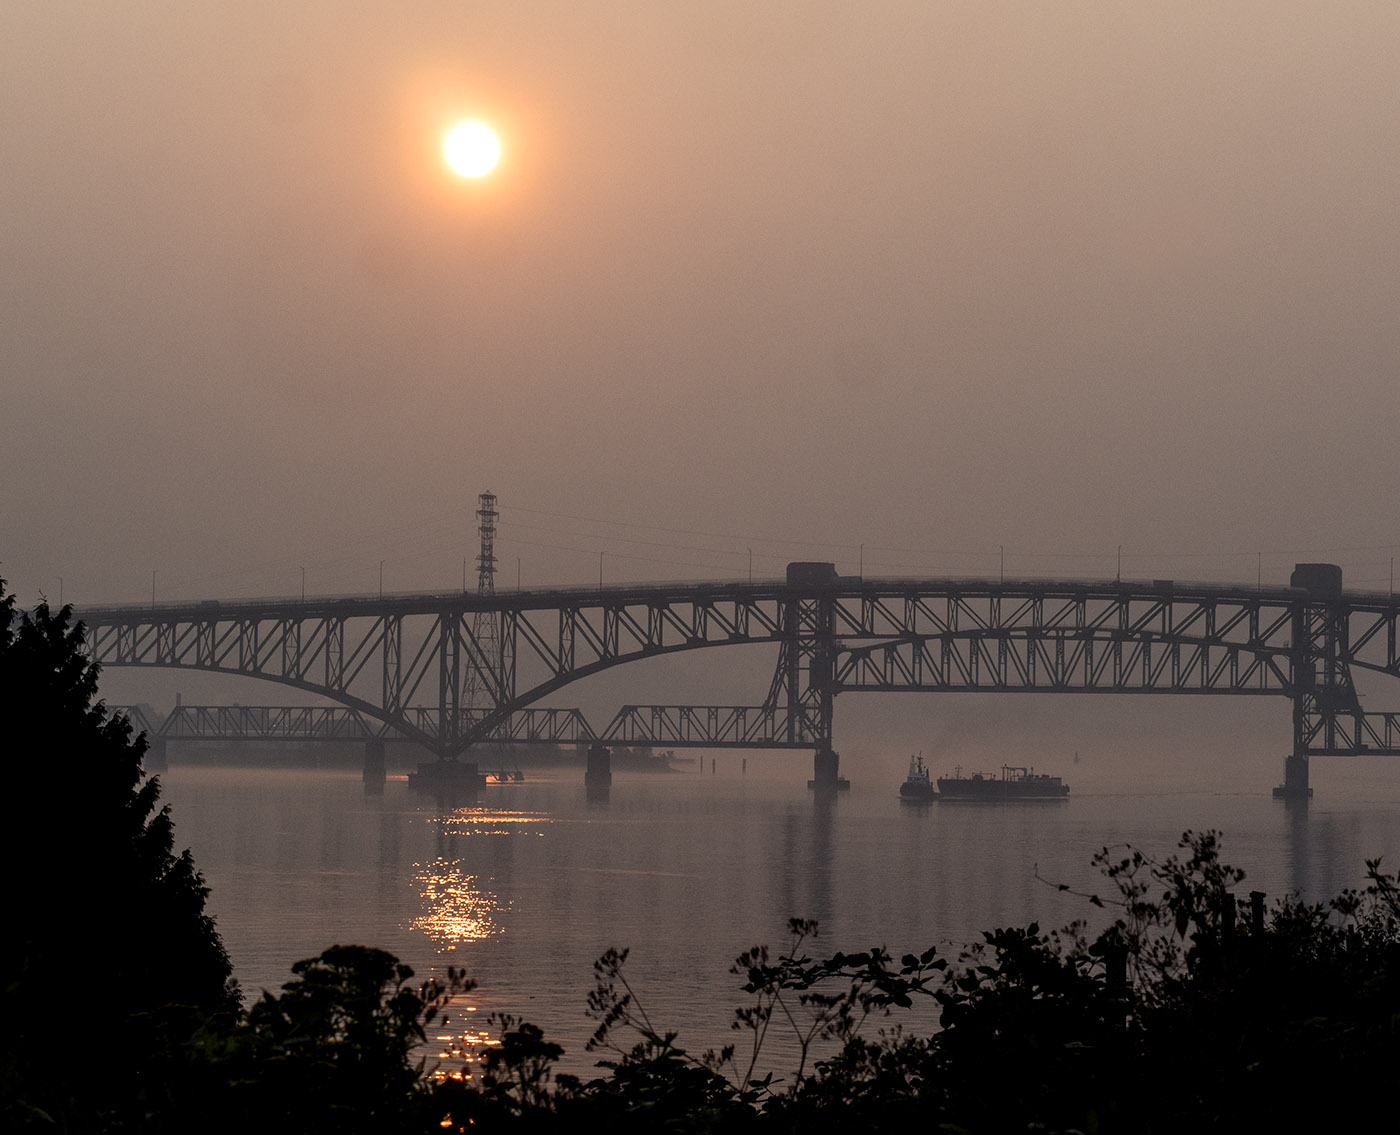 Apocolypse Sunrise over Iron Workers Bridge